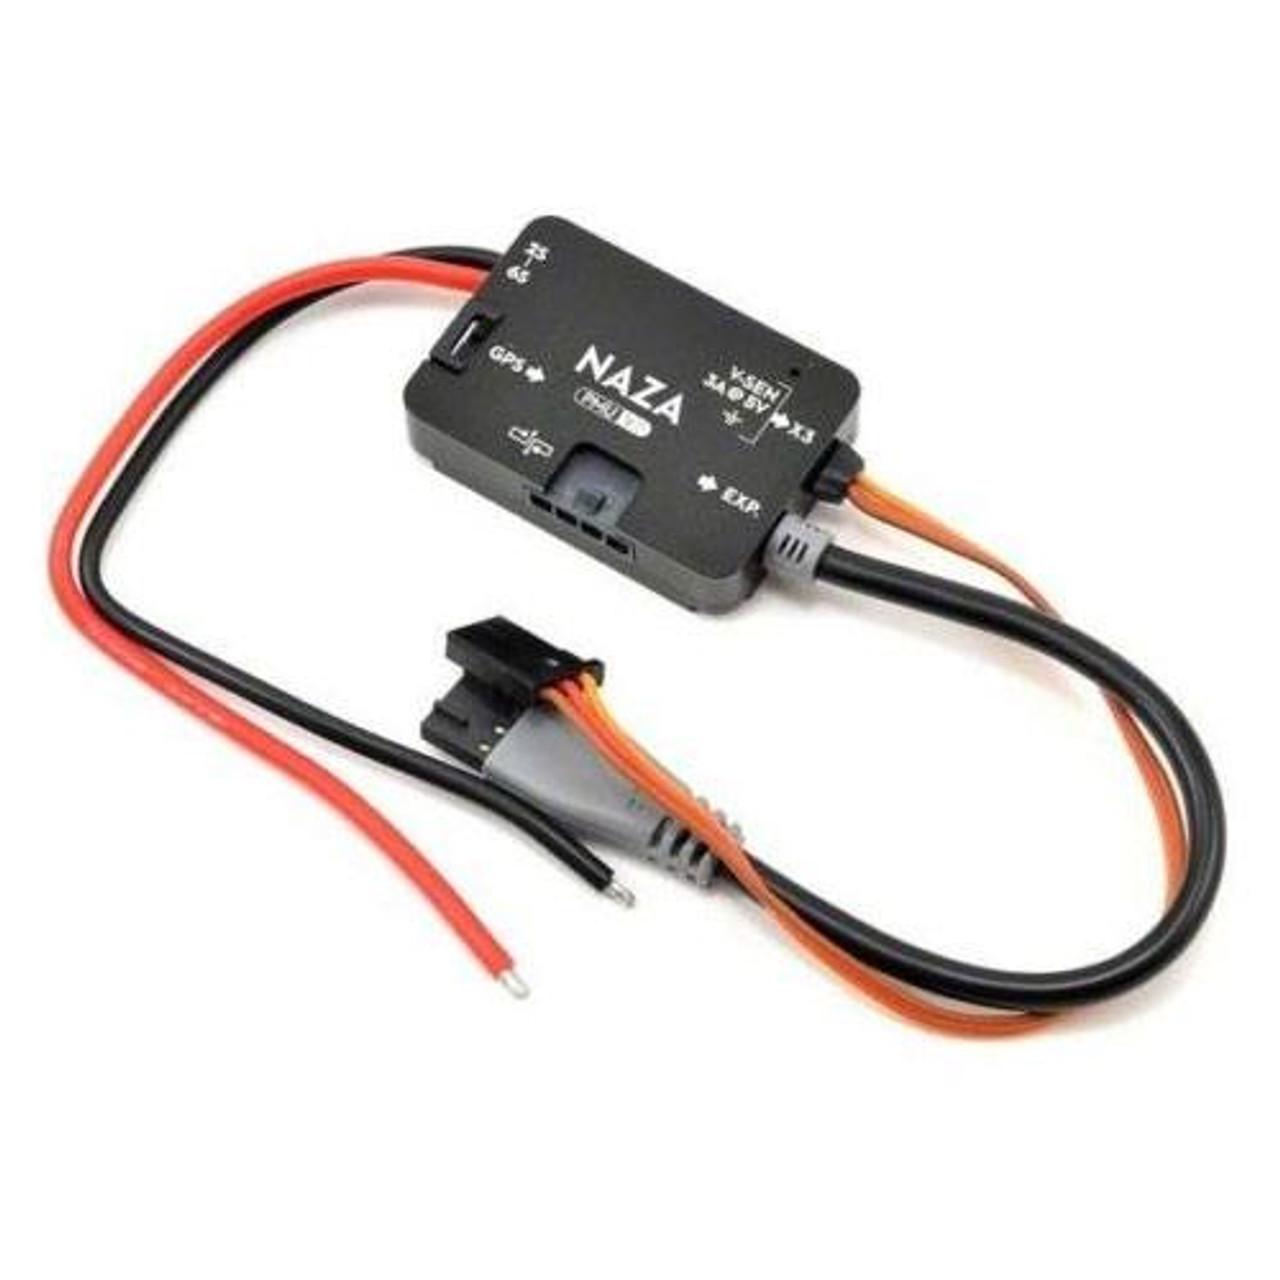 PMU Power Management Unit - US dealer DJI DJI NAZA-M V2